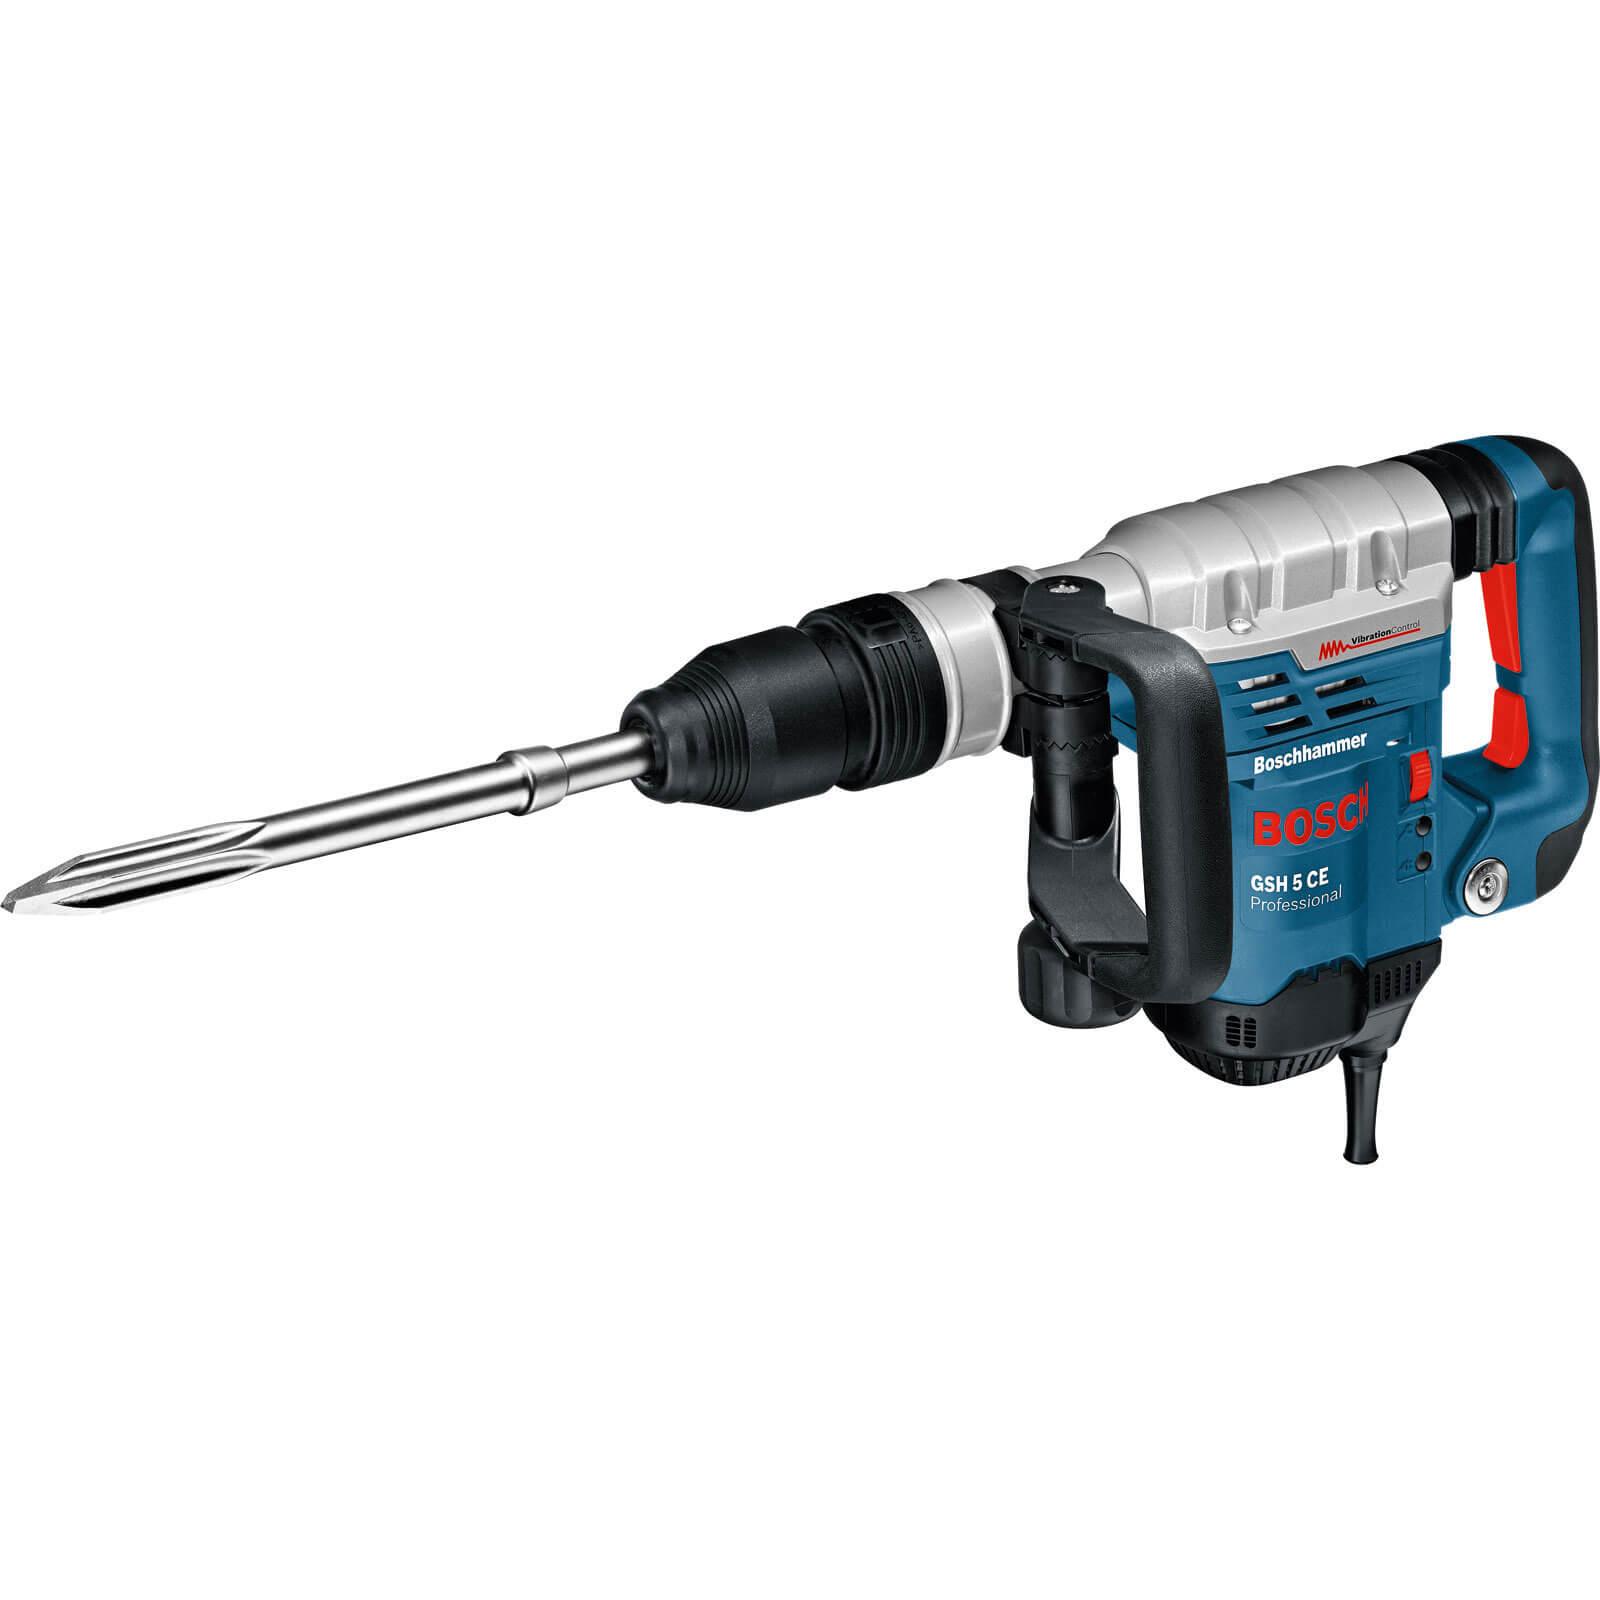 Image of Bosch GSH 5CE SDS Max Demolition Hammer 240v